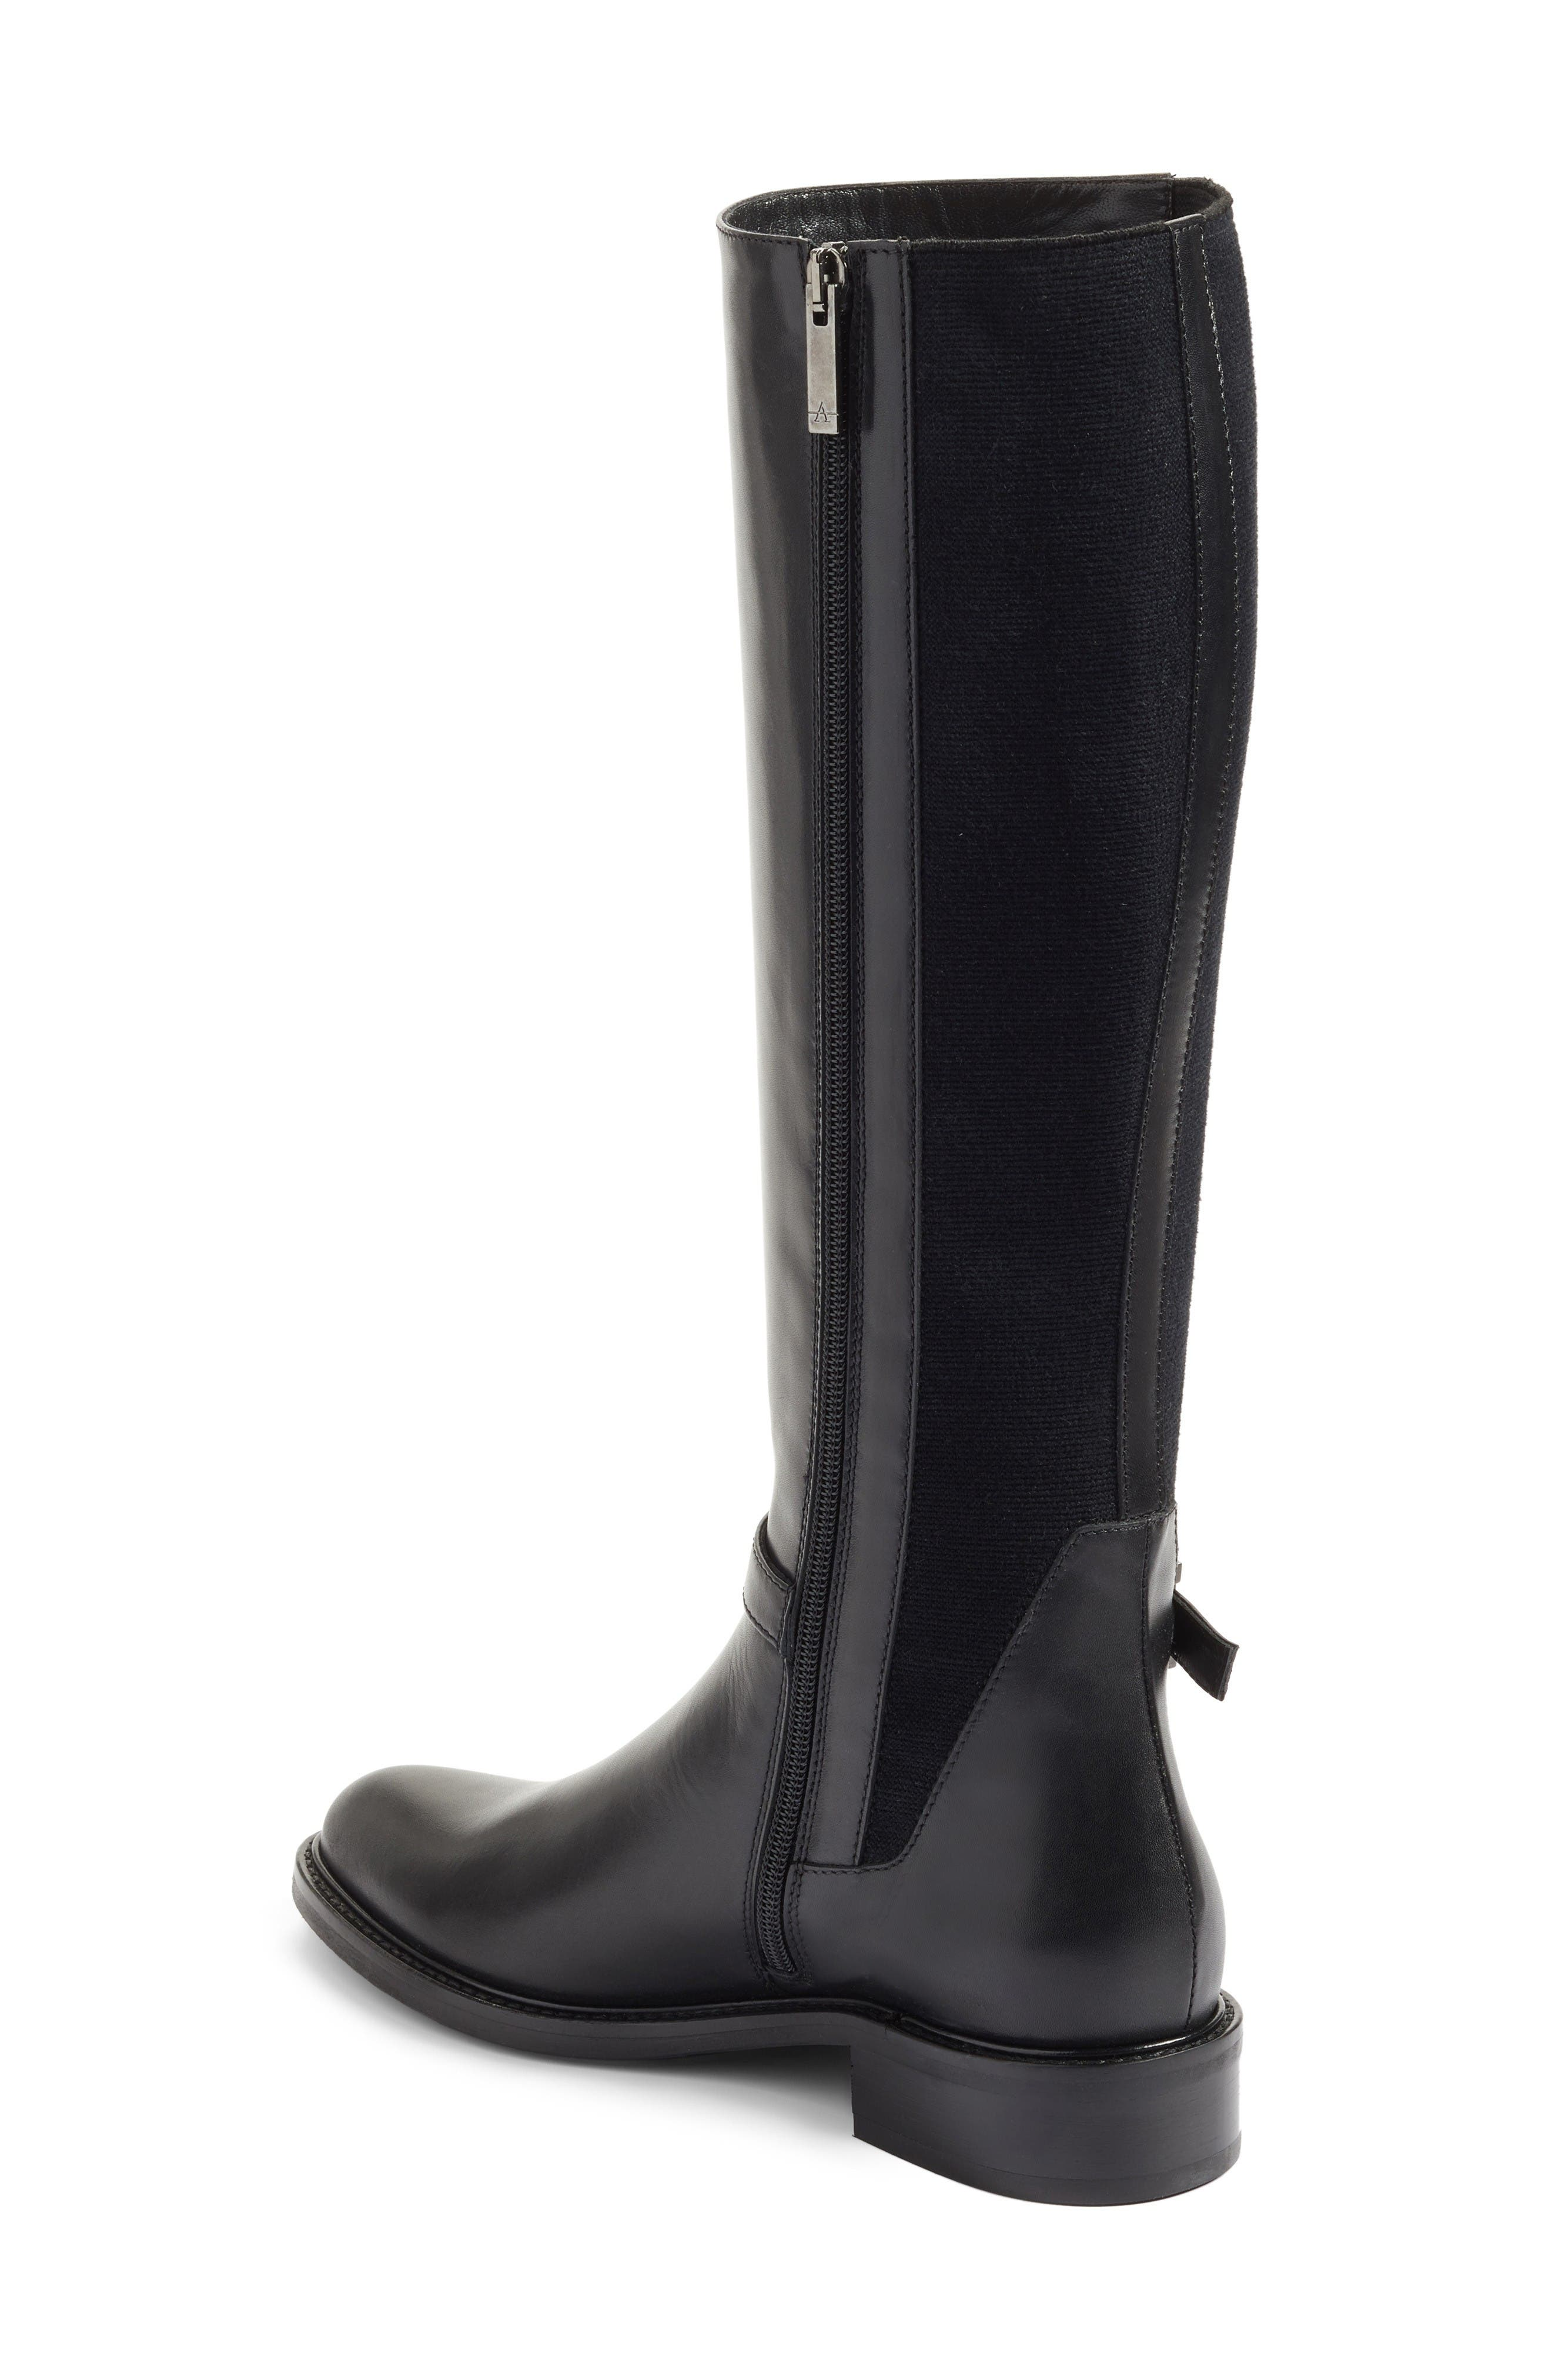 Genna Weatherproof Tall Boot,                             Alternate thumbnail 3, color,                             Black Calf/ Elastic/ Suede